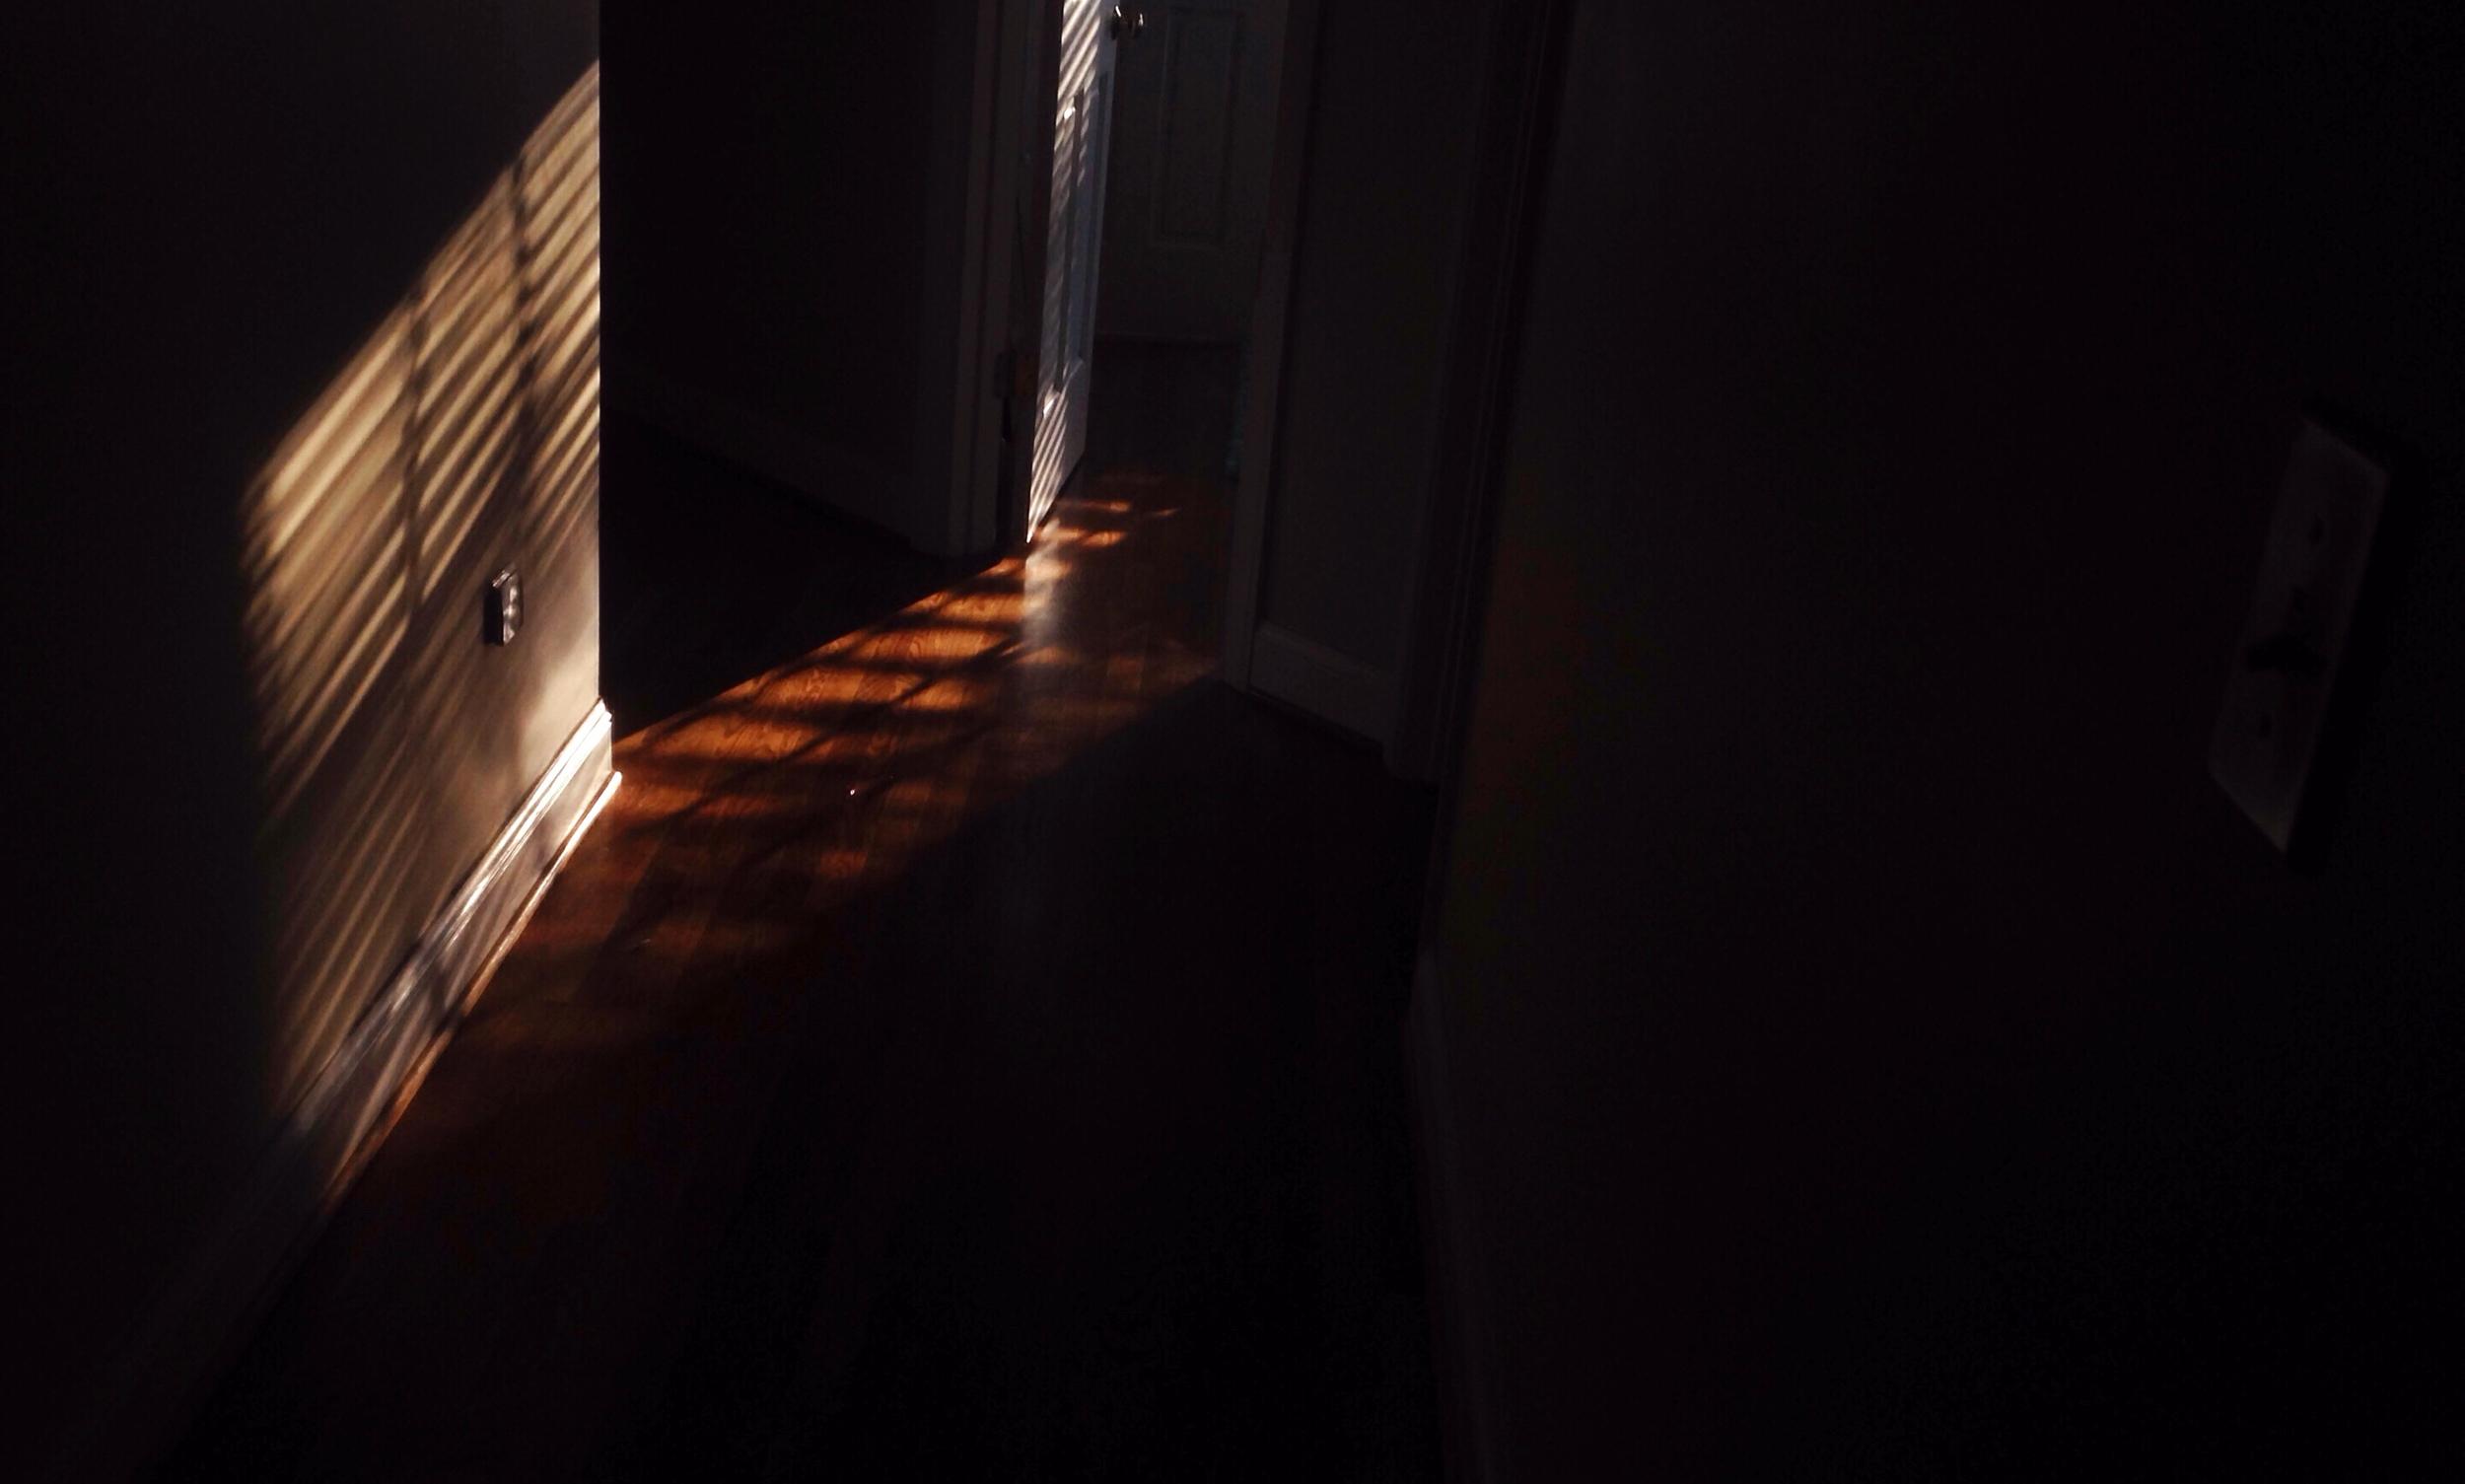 That sweet morning light...